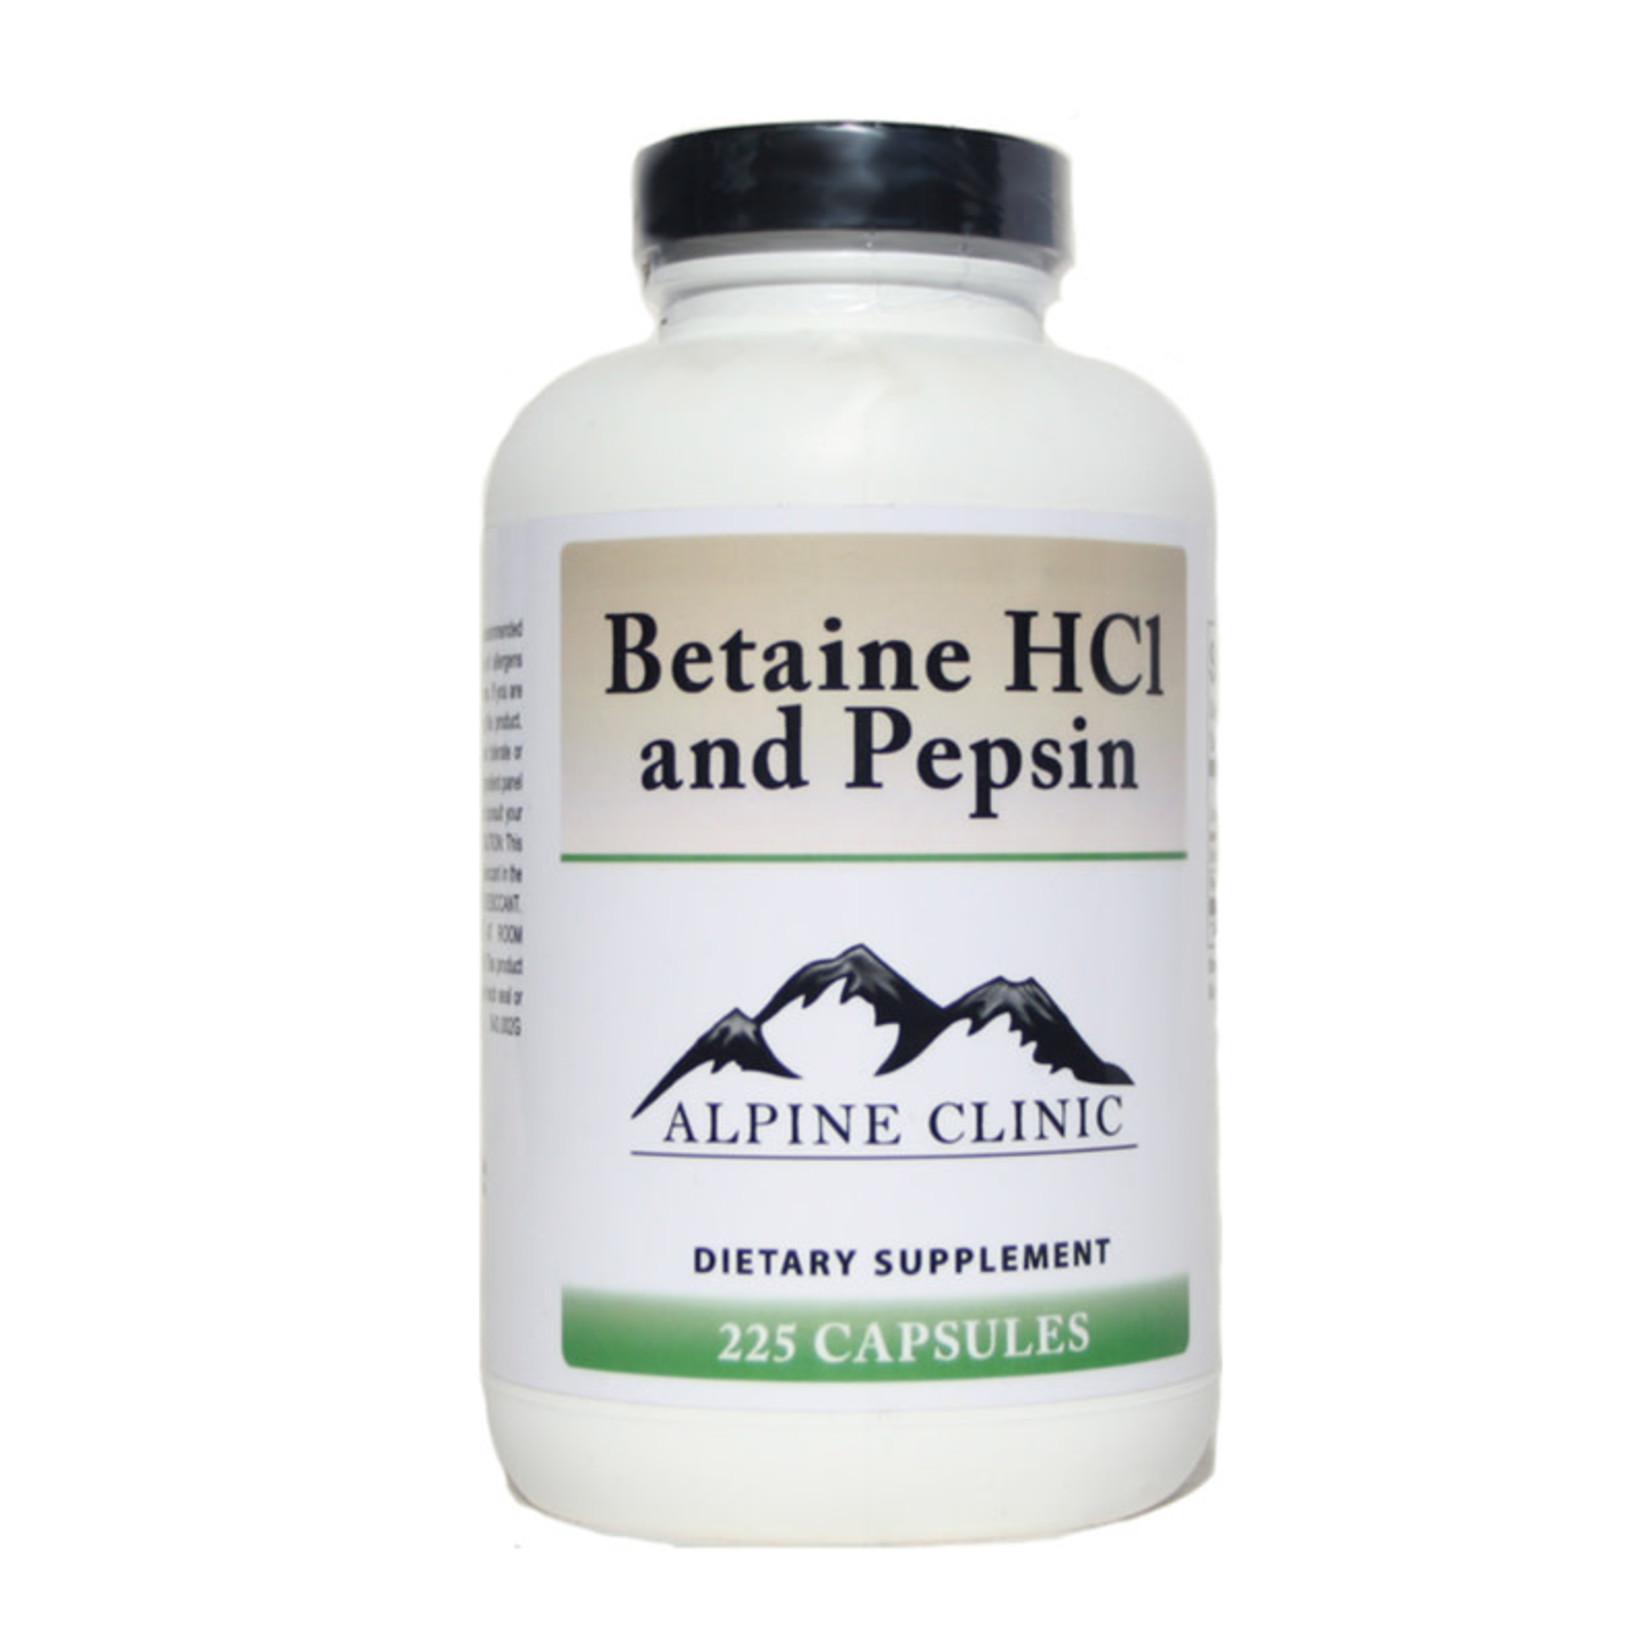 Alpine Clinic PL Betaine HCI & Pepsin